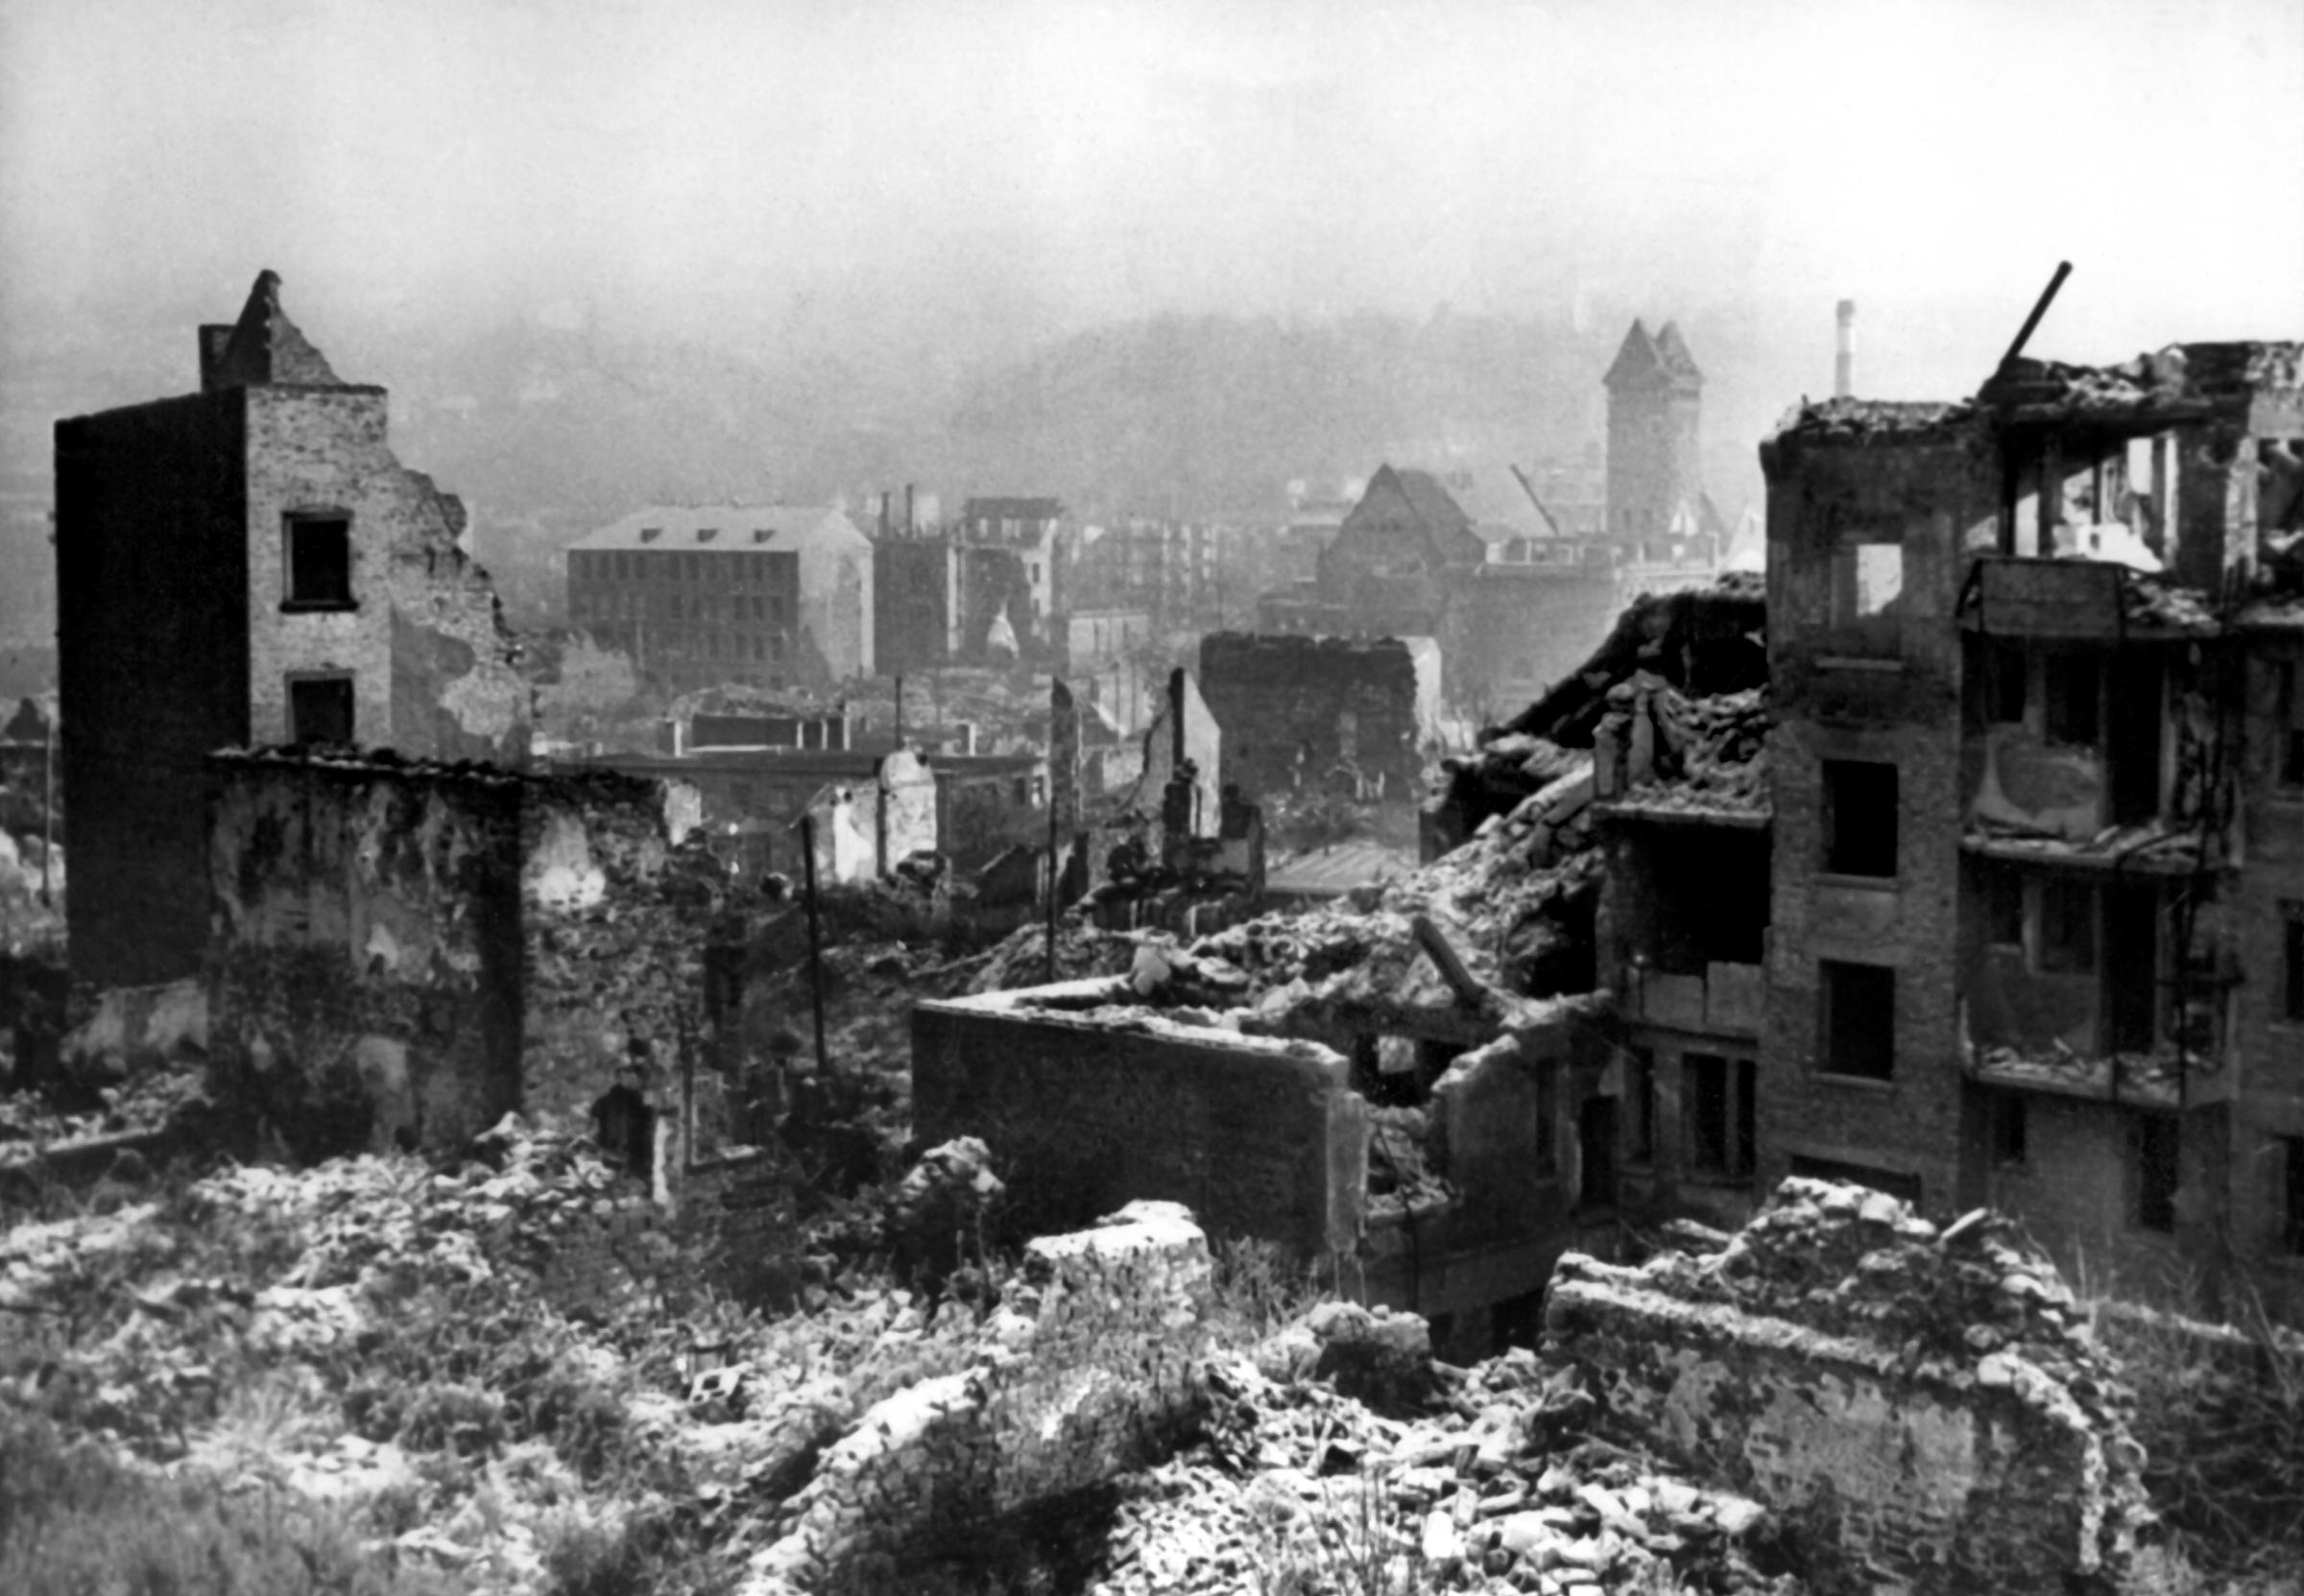 Das zerstörte Pforzheim nach dem Bombenangriff Foto: (c) dpa